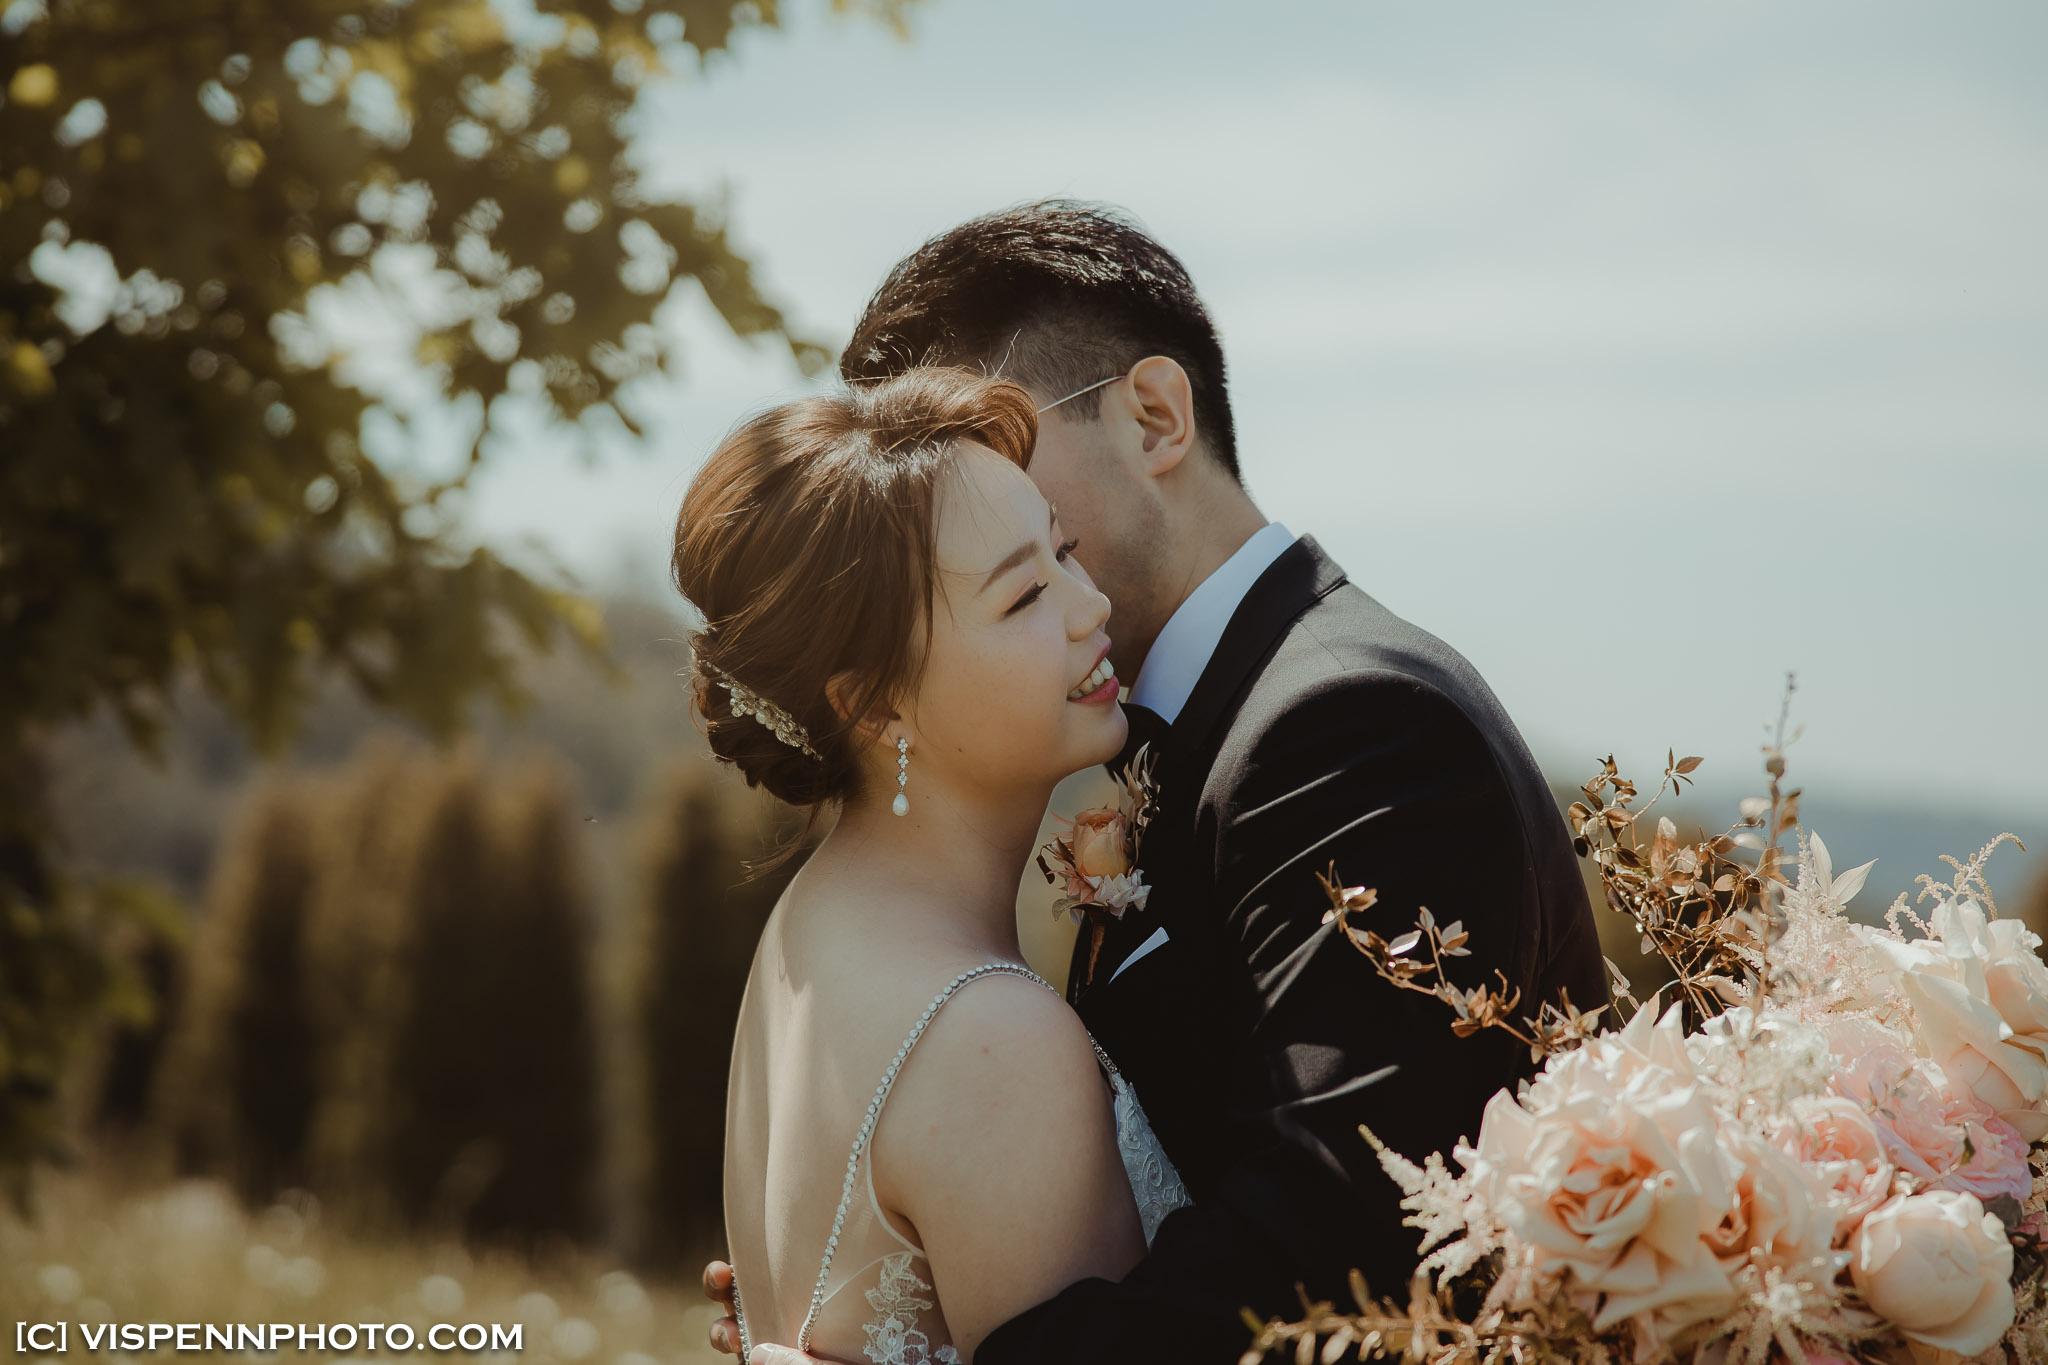 WEDDING DAY Photography Melbourne ElitaPB 05736 1P EOSR ZHPENN